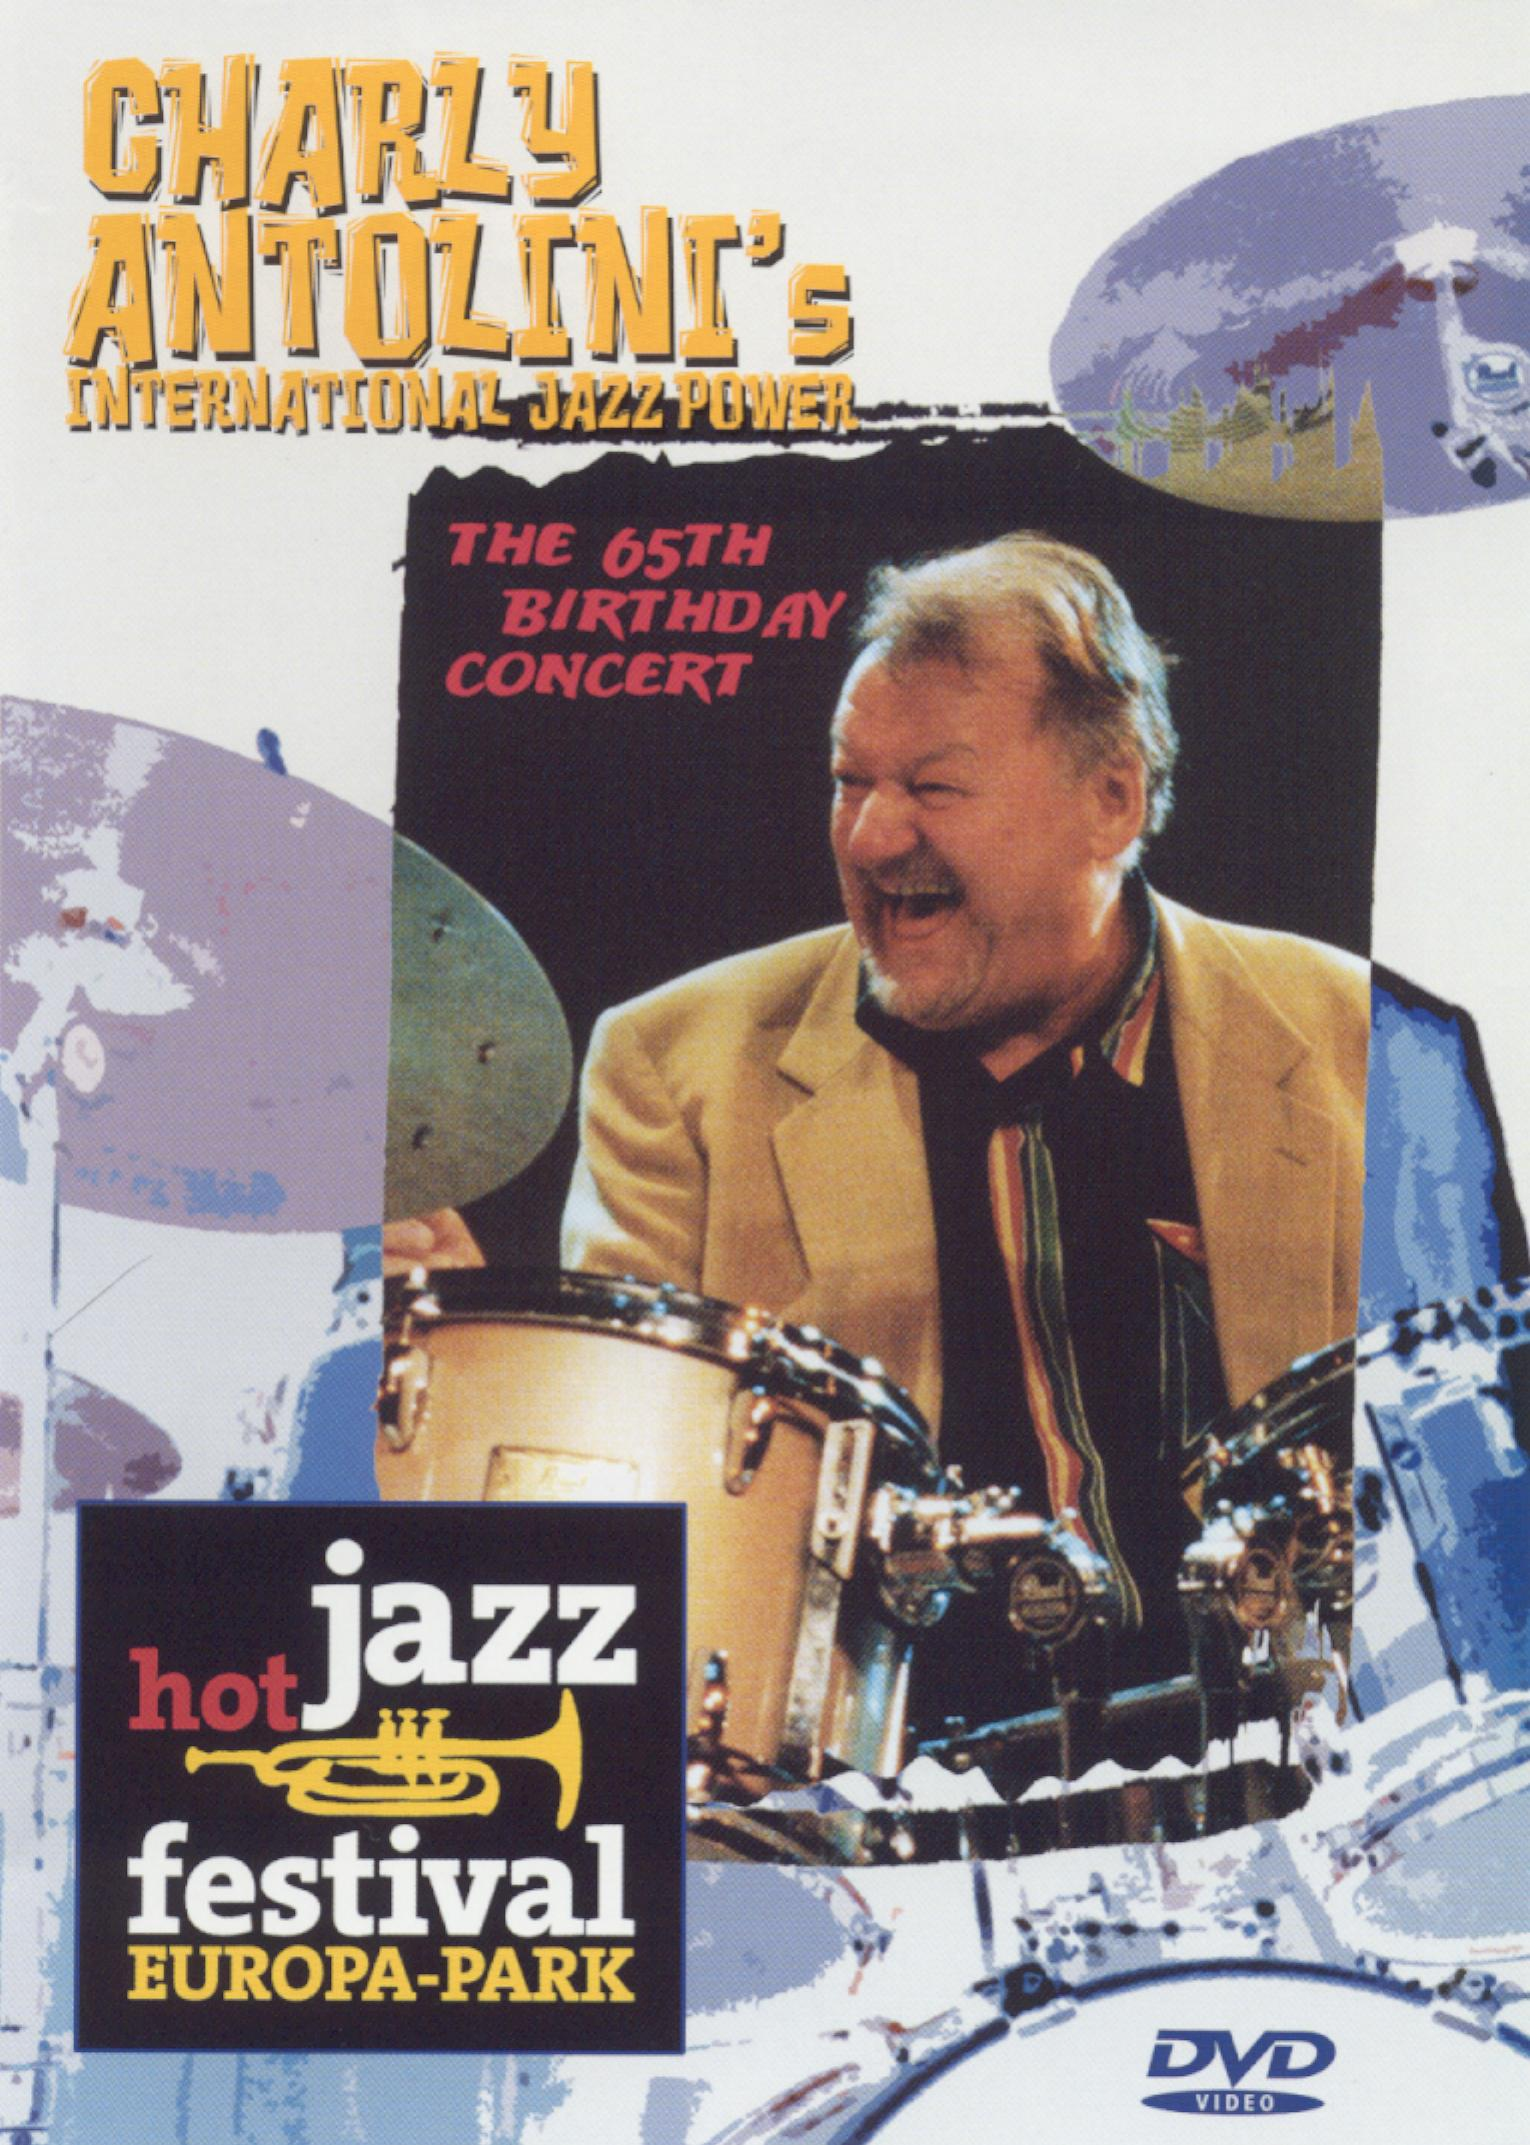 Charly Antolini's International Jazz Power: Hot Jazz Festival - Europa-Park